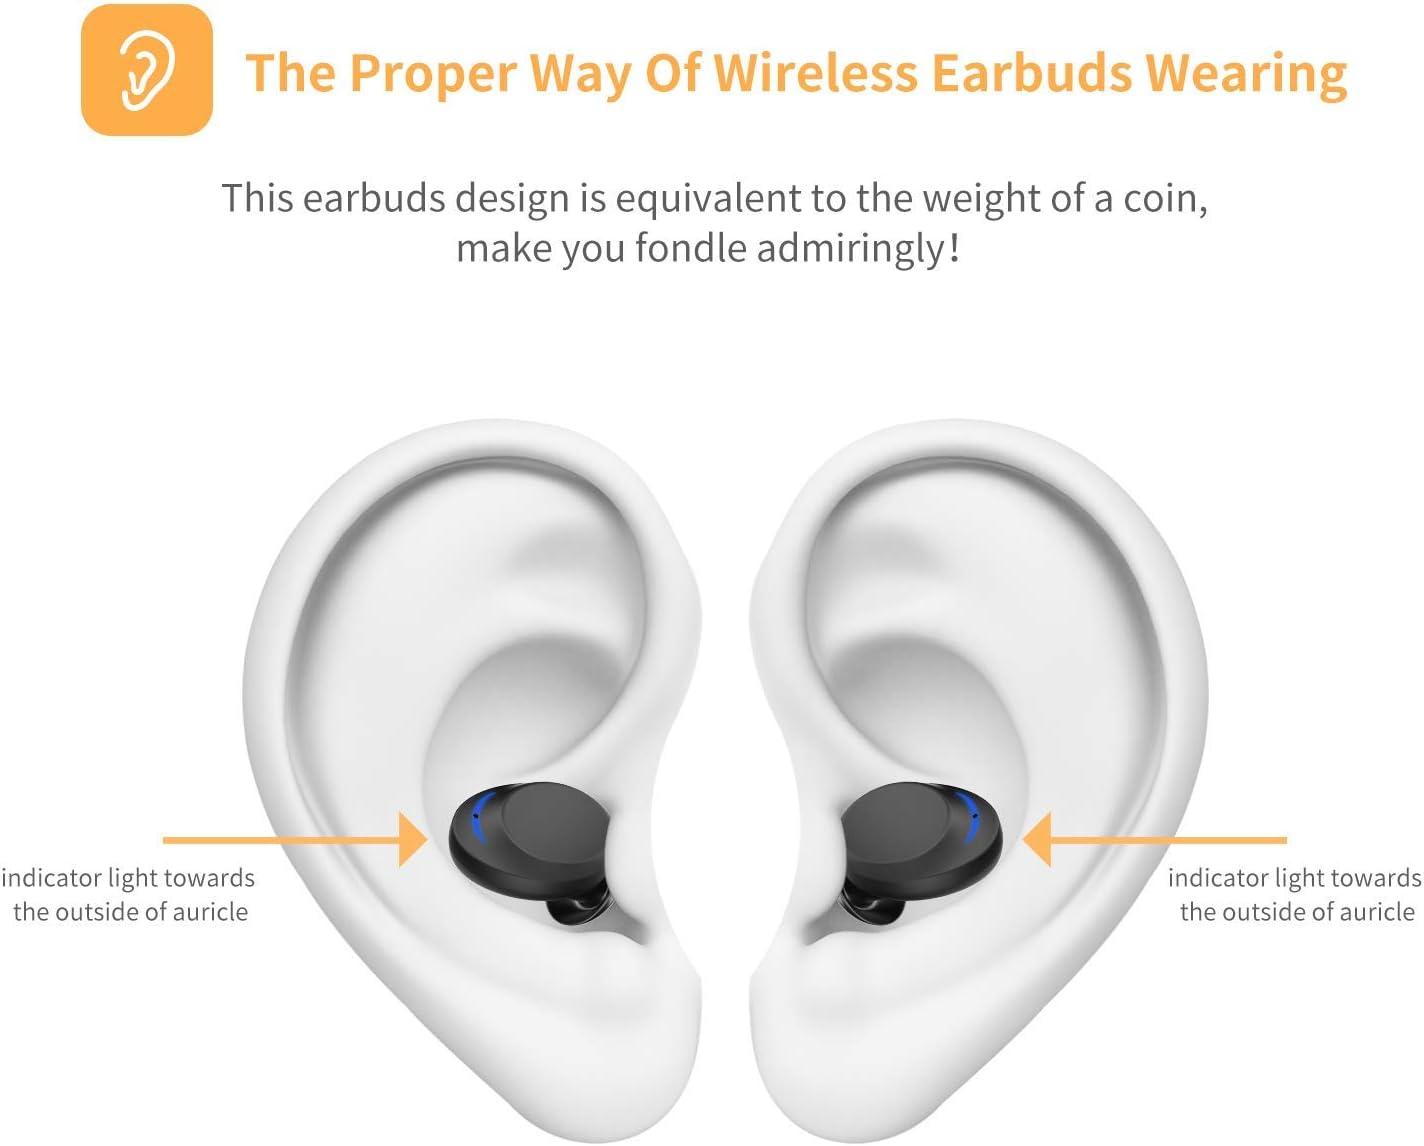 Wireless Earbuds UNIOJO TWS Bluetooth 5.0 Headphones Premium IPX8 Waterproof Headphones Mini in-Ear 3D Stereo Sound Wireless Earphone with 3000mAh Charging Case